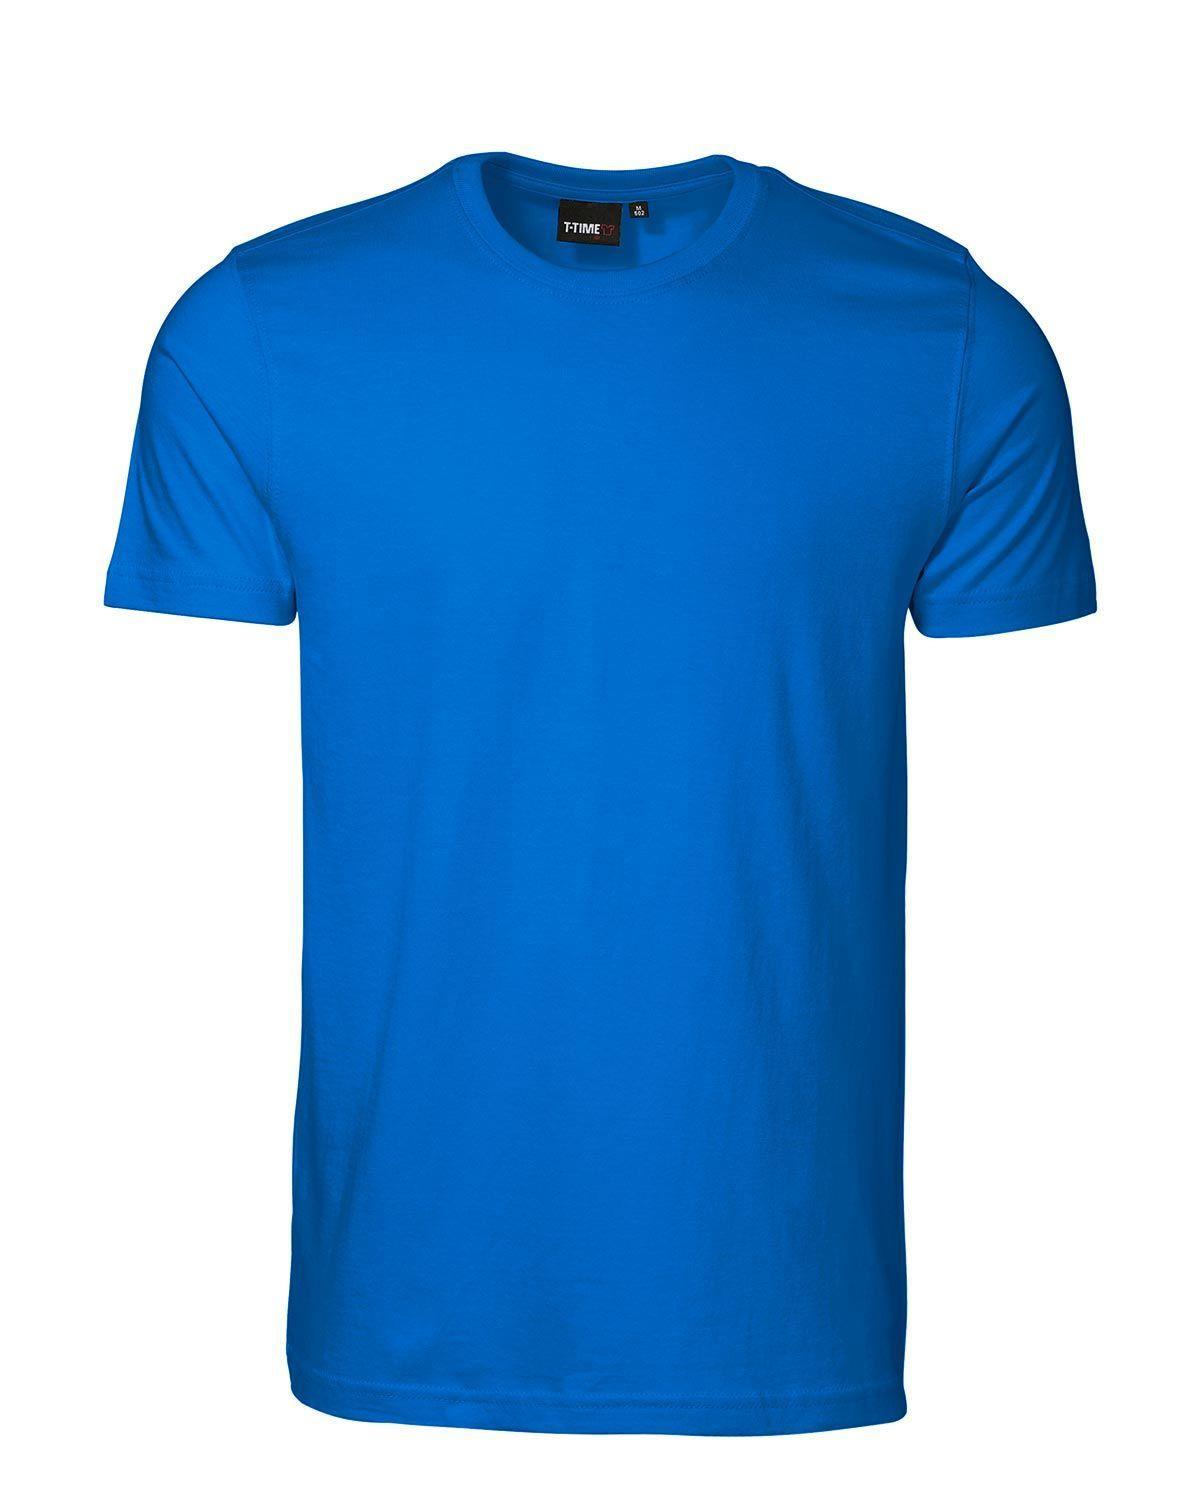 ID T-shirt, Sporty-Fit (Azure, 3XL)